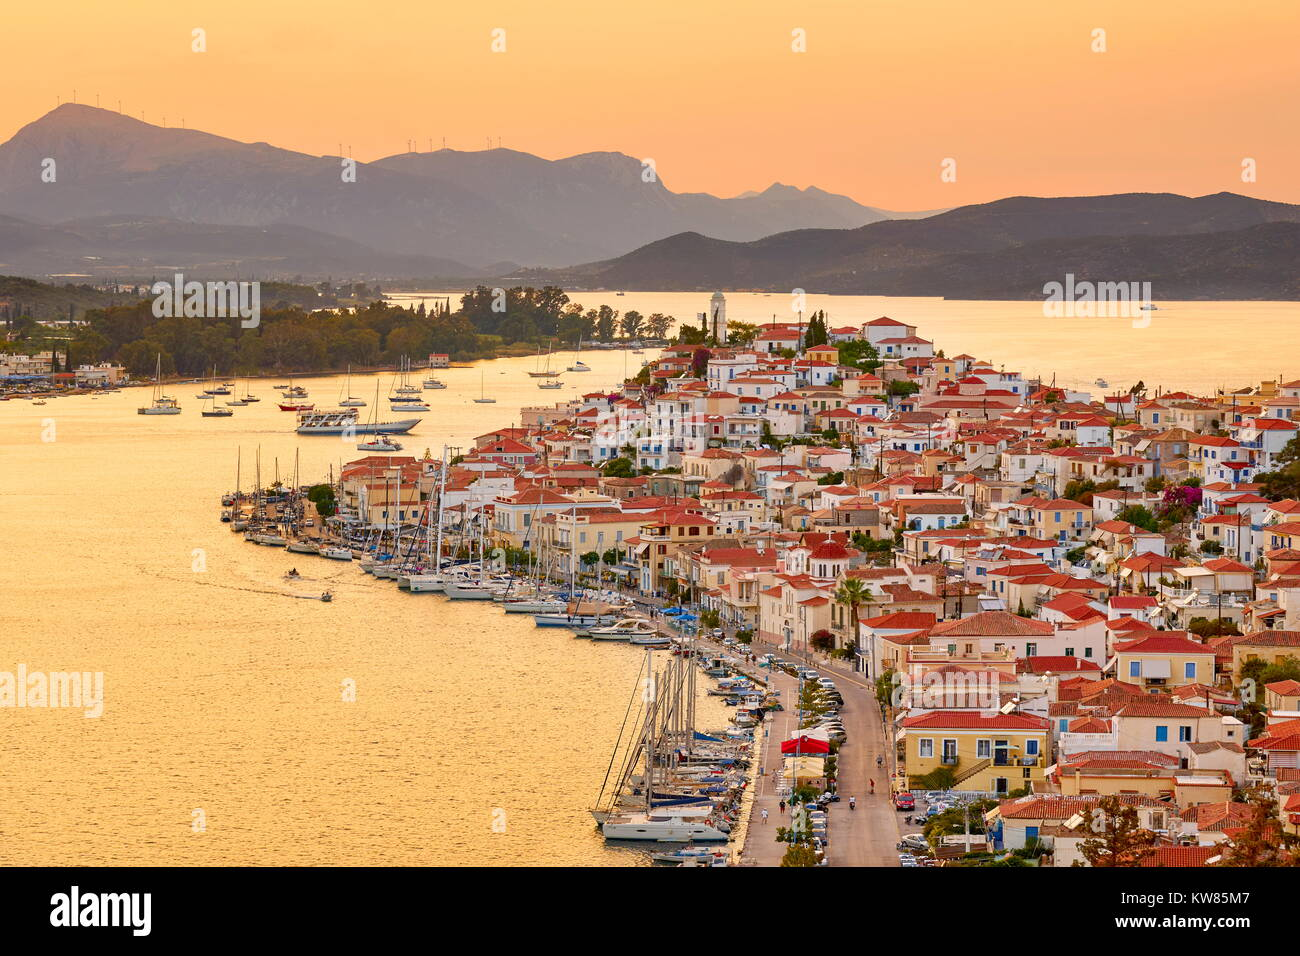 Poros Island, at sunset time, Argolida, Peloponnese, Greece - Stock Image